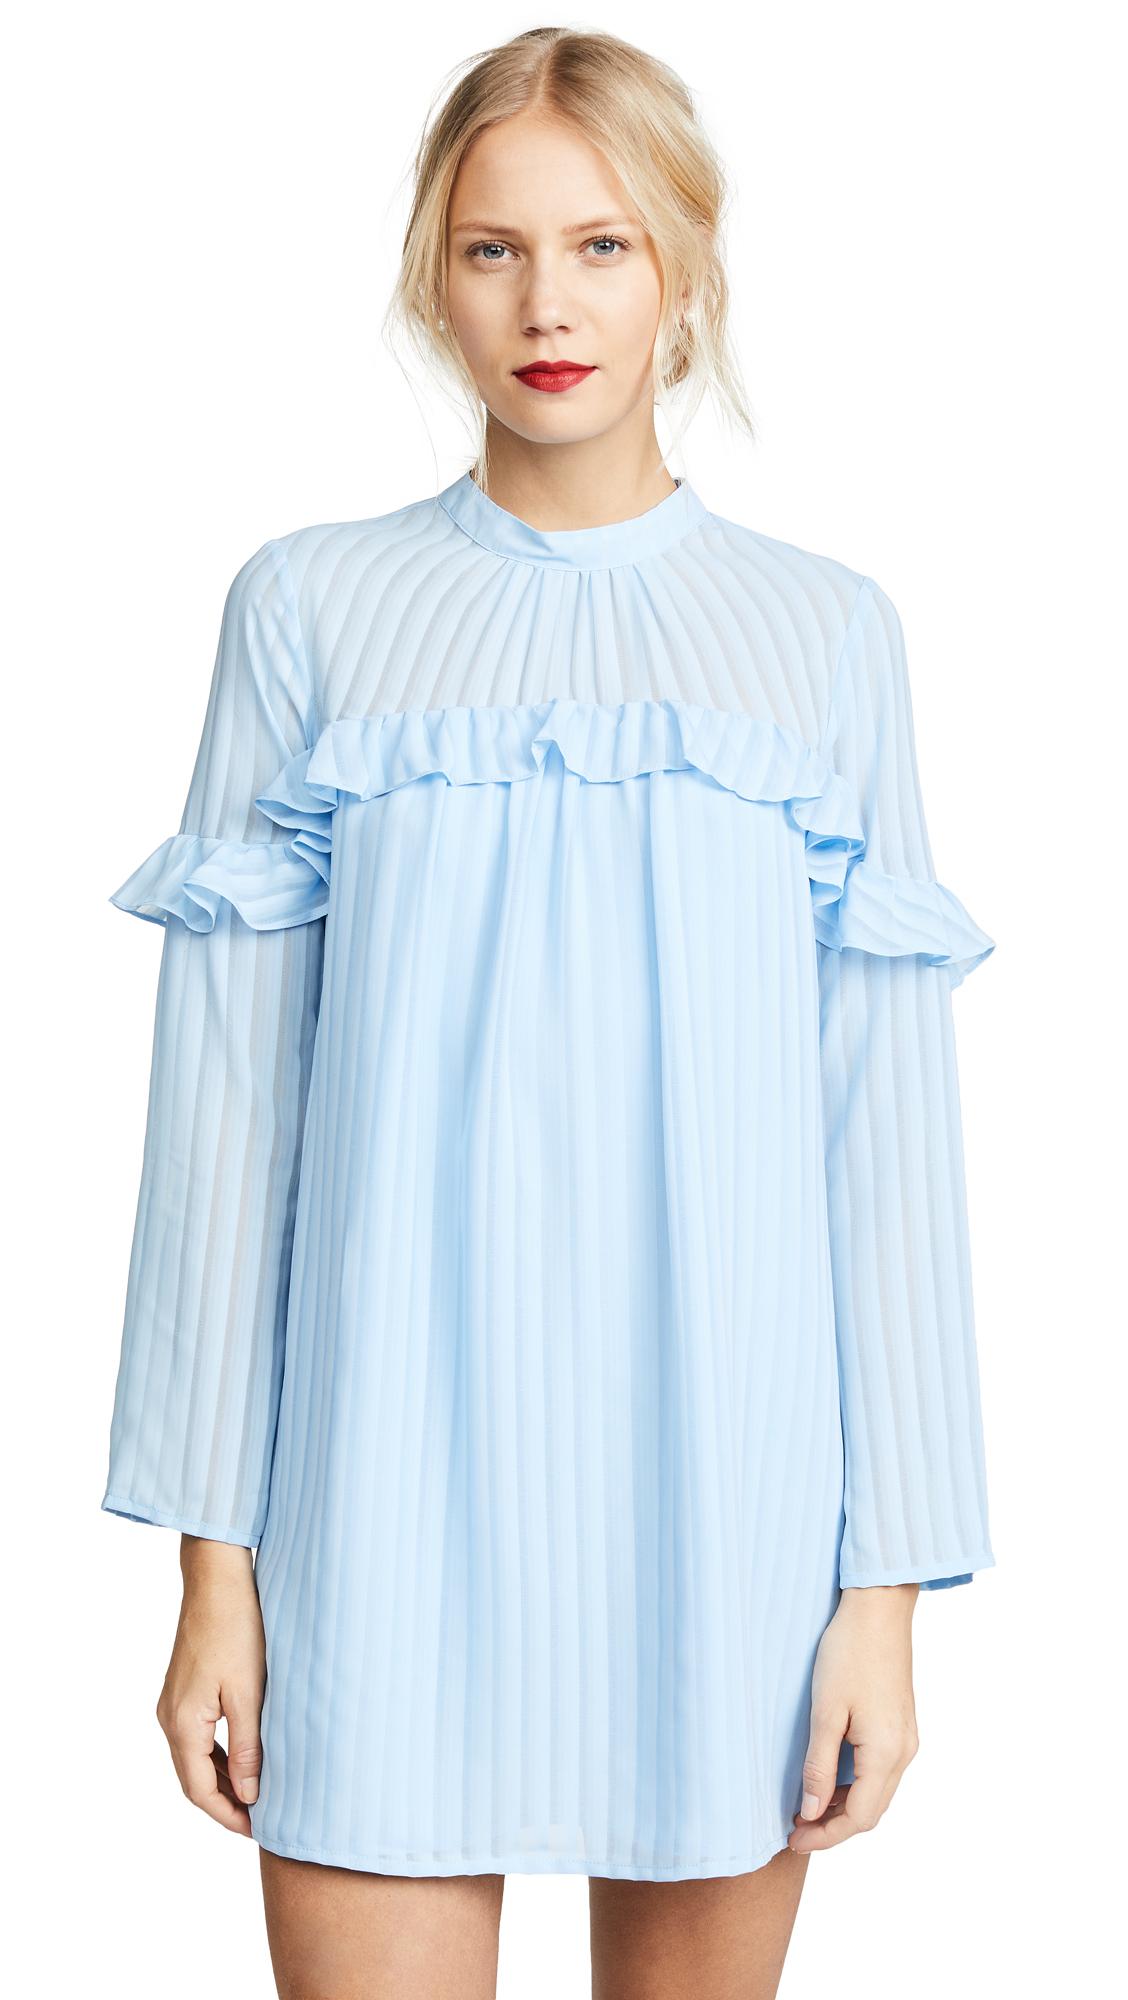 Ali & Jay That's Amore Mini Dress